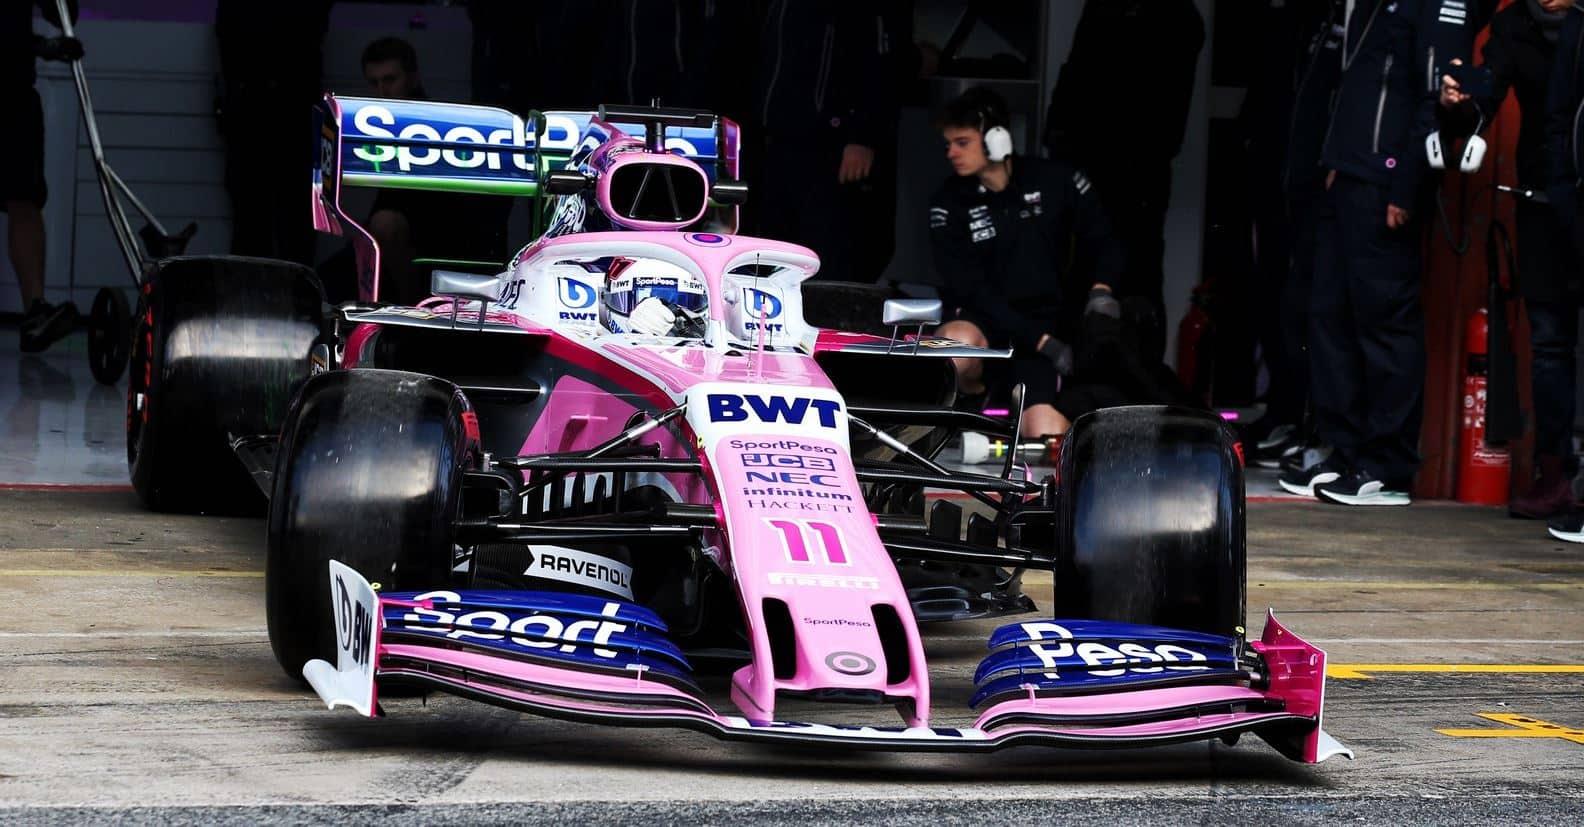 2019 Racing Point F1 car Barcelona pitlane